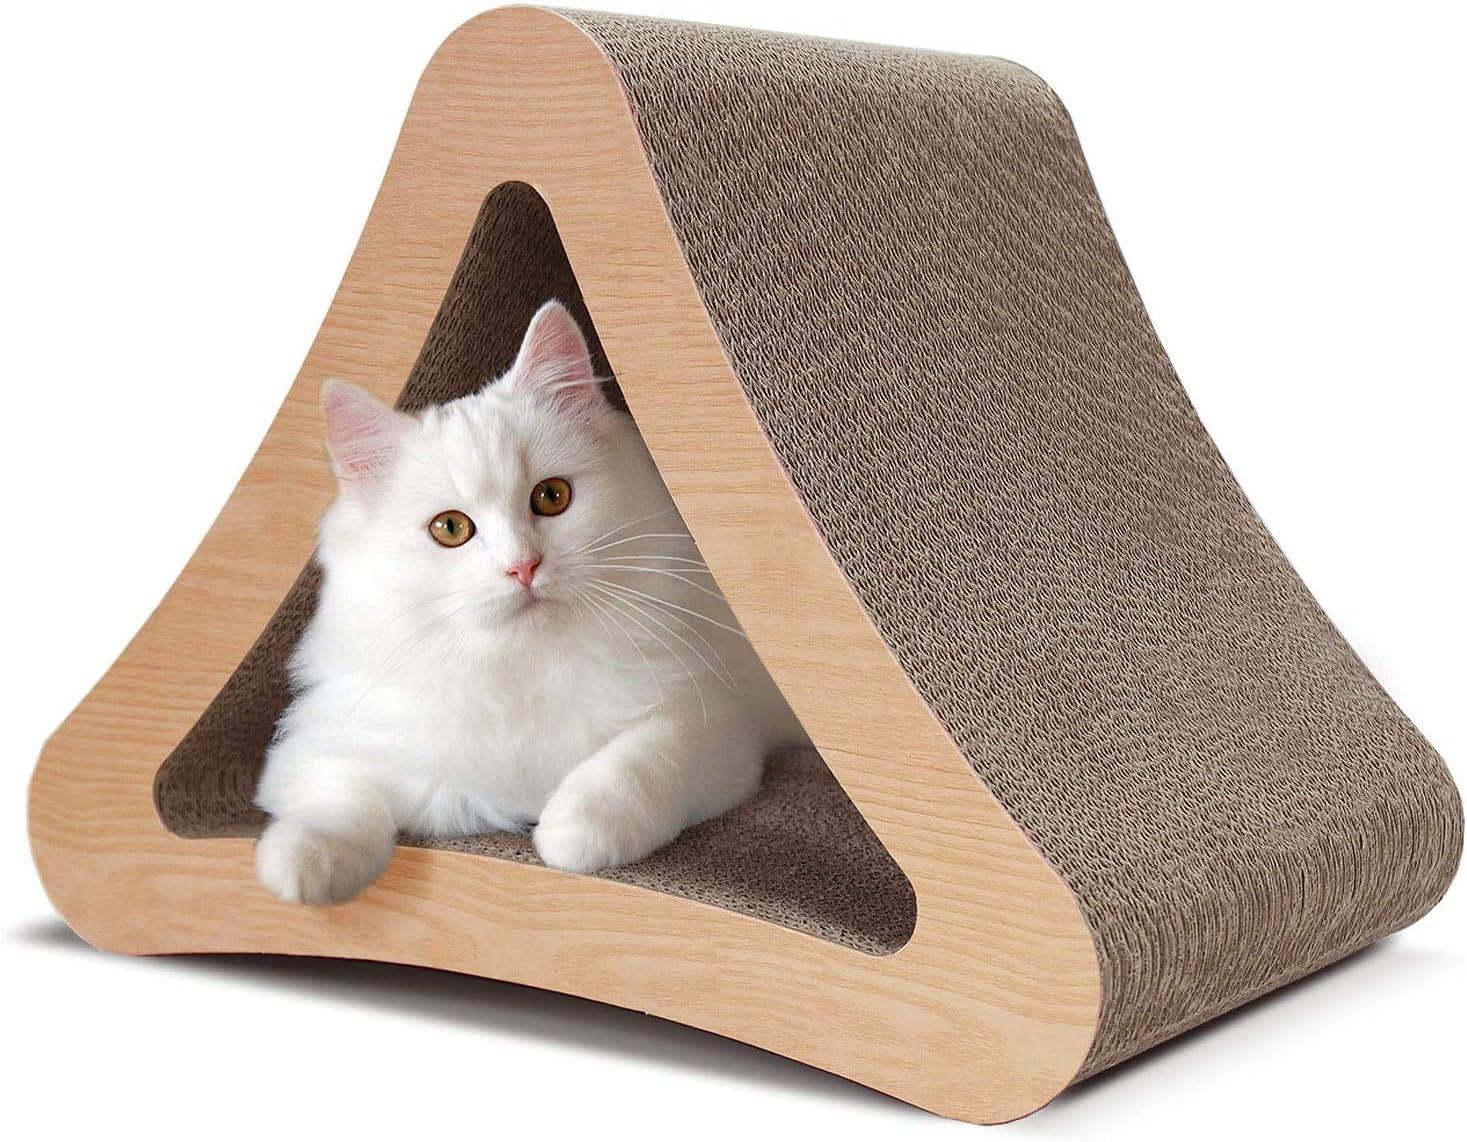 ScratchMe 3-Sided Triangle Cat Scratcher Cardboa Max 64% OFF Scratching Post Max 77% OFF